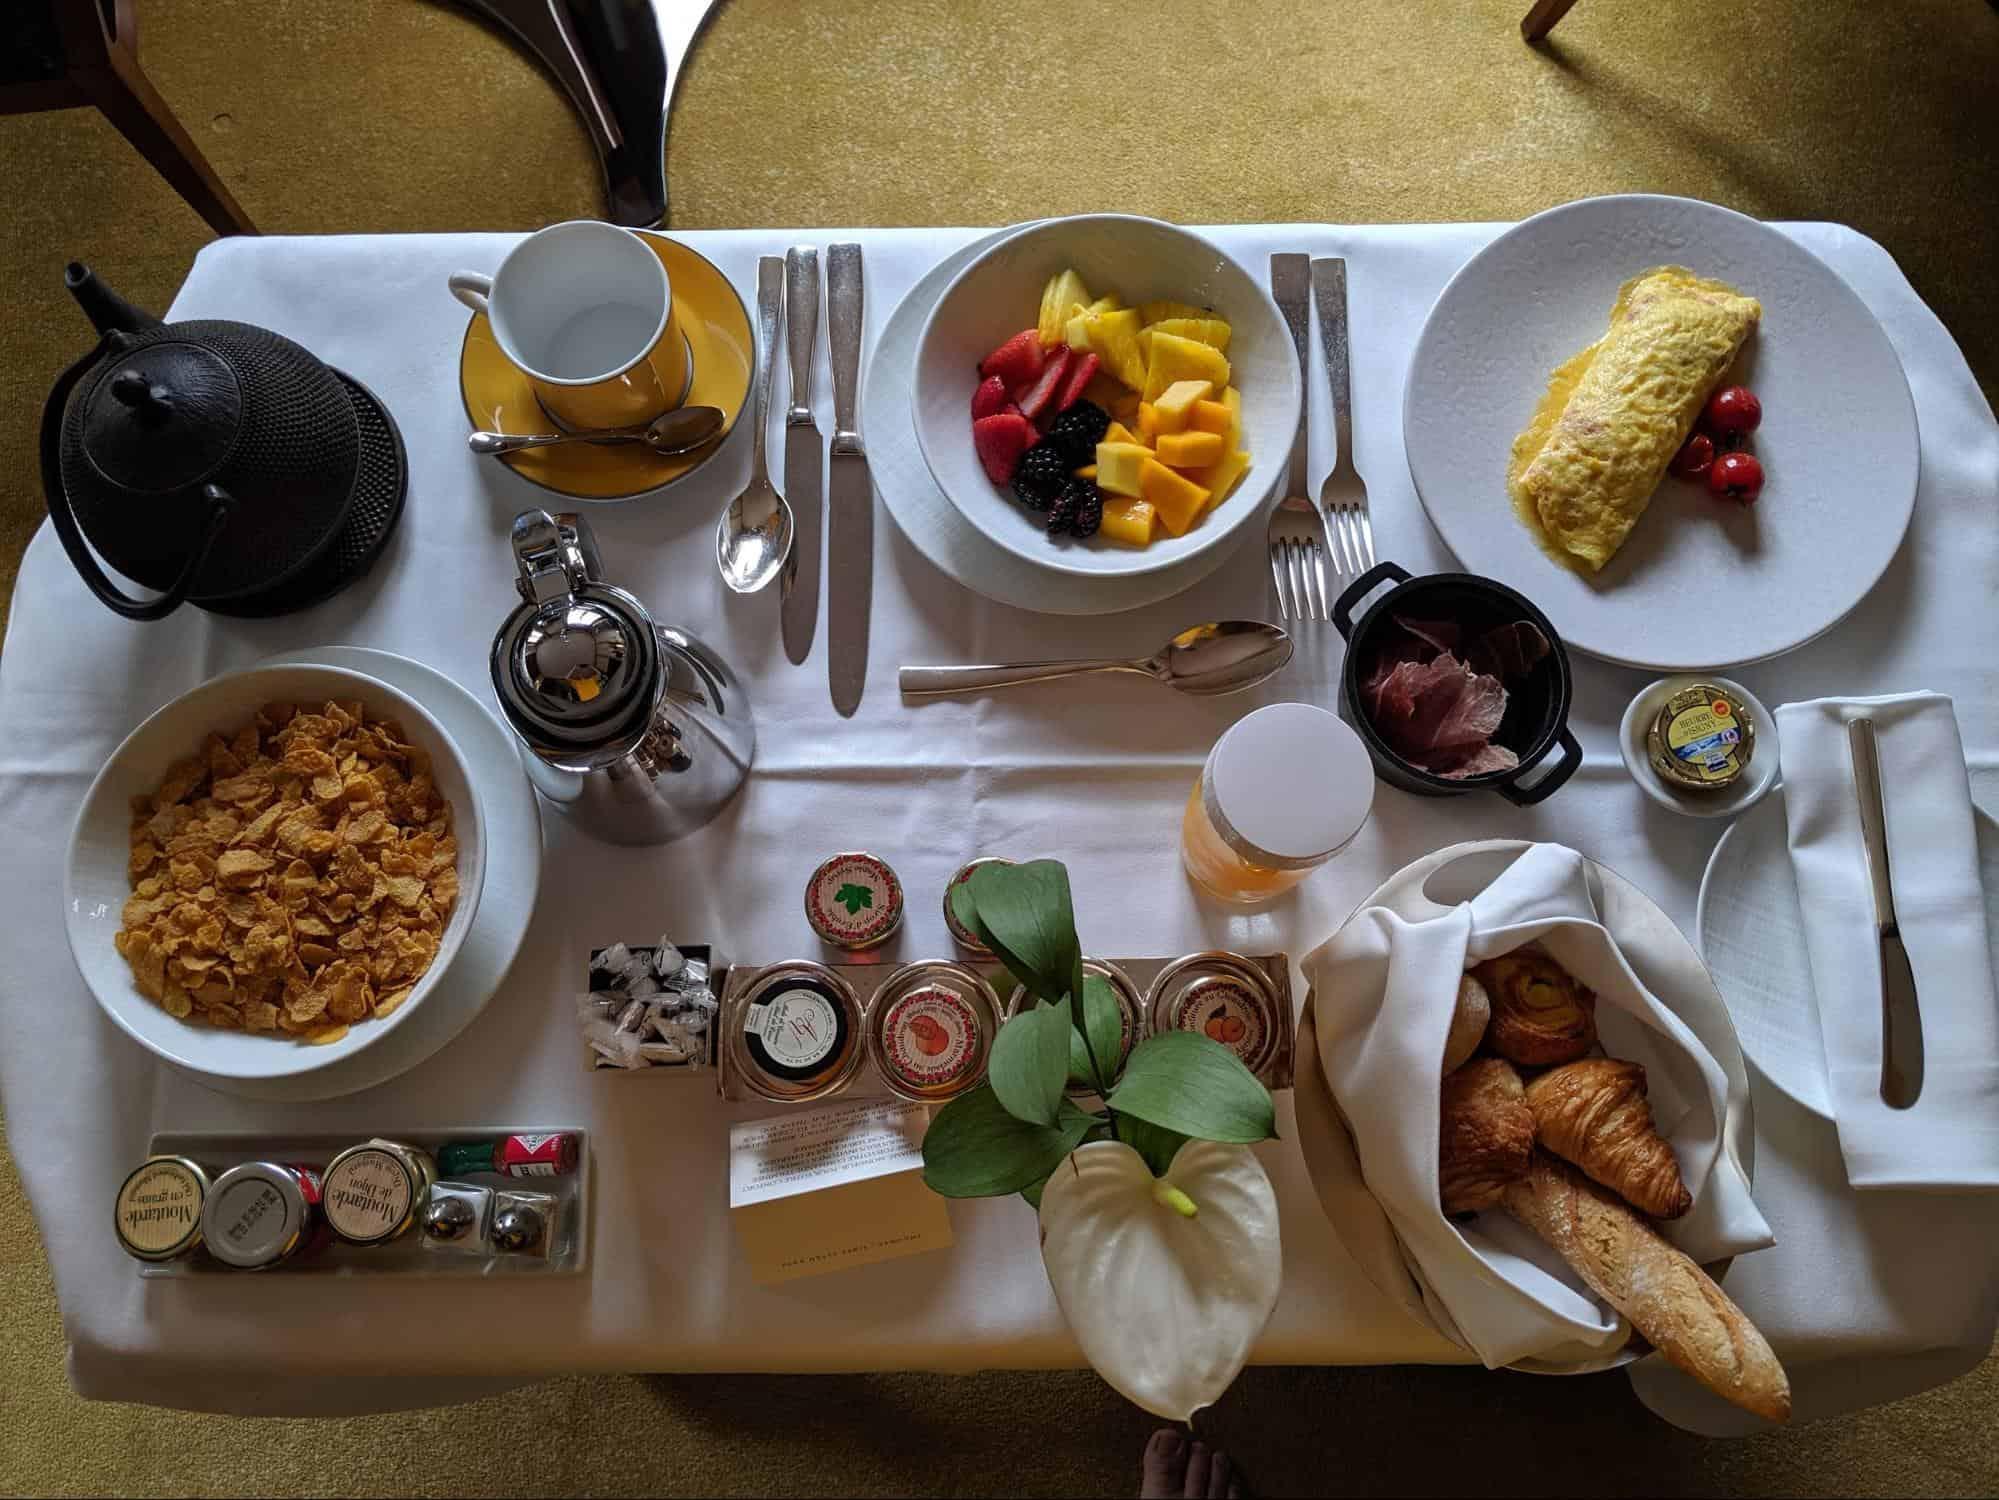 Room Service American Breakfast Park Hyatt Paris-Vendome